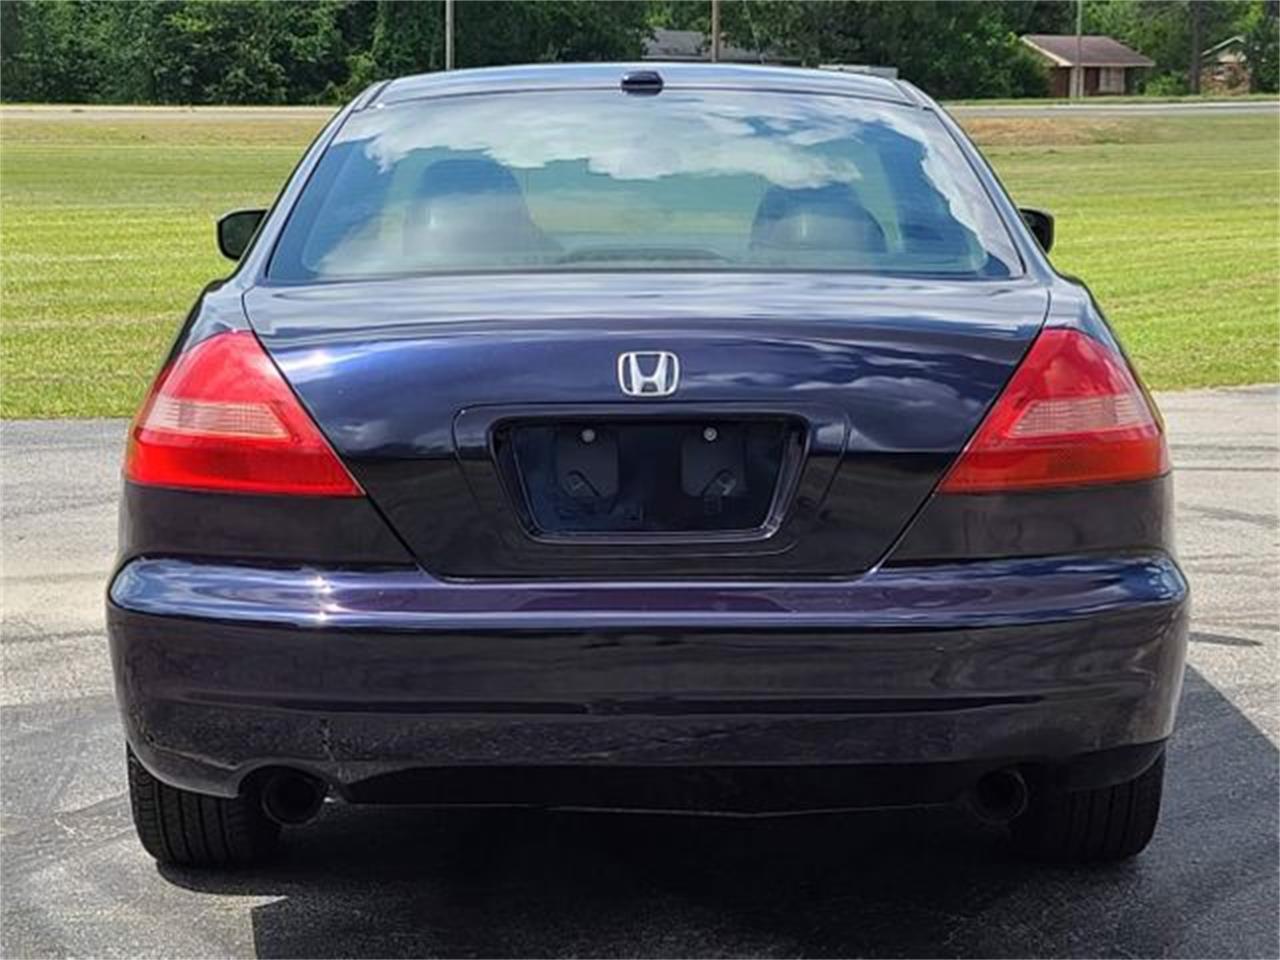 2005 Honda Accord (CC-1355107) for sale in Hope Mills, North Carolina